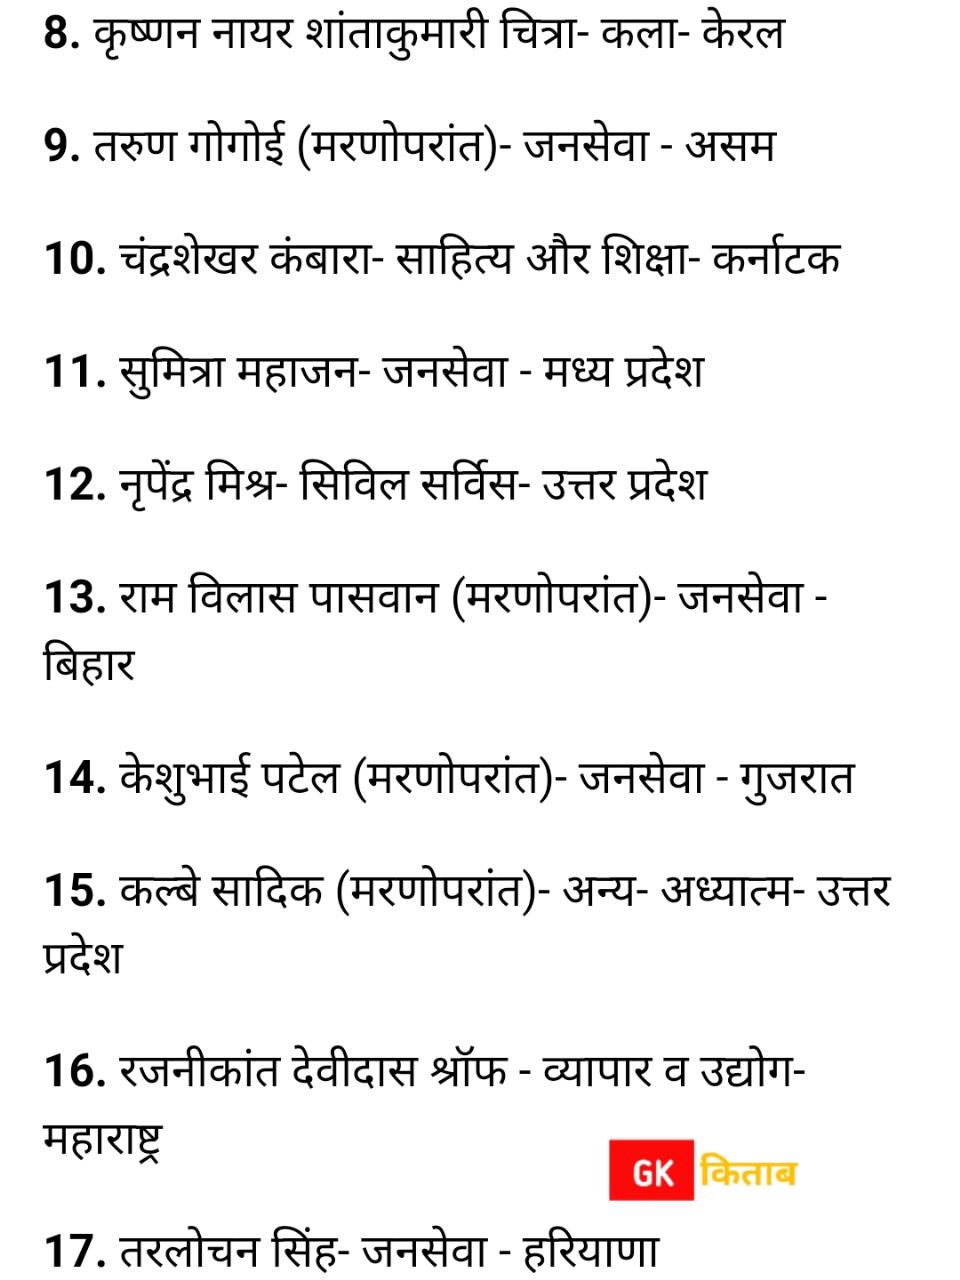 Padma bhushan award 2021